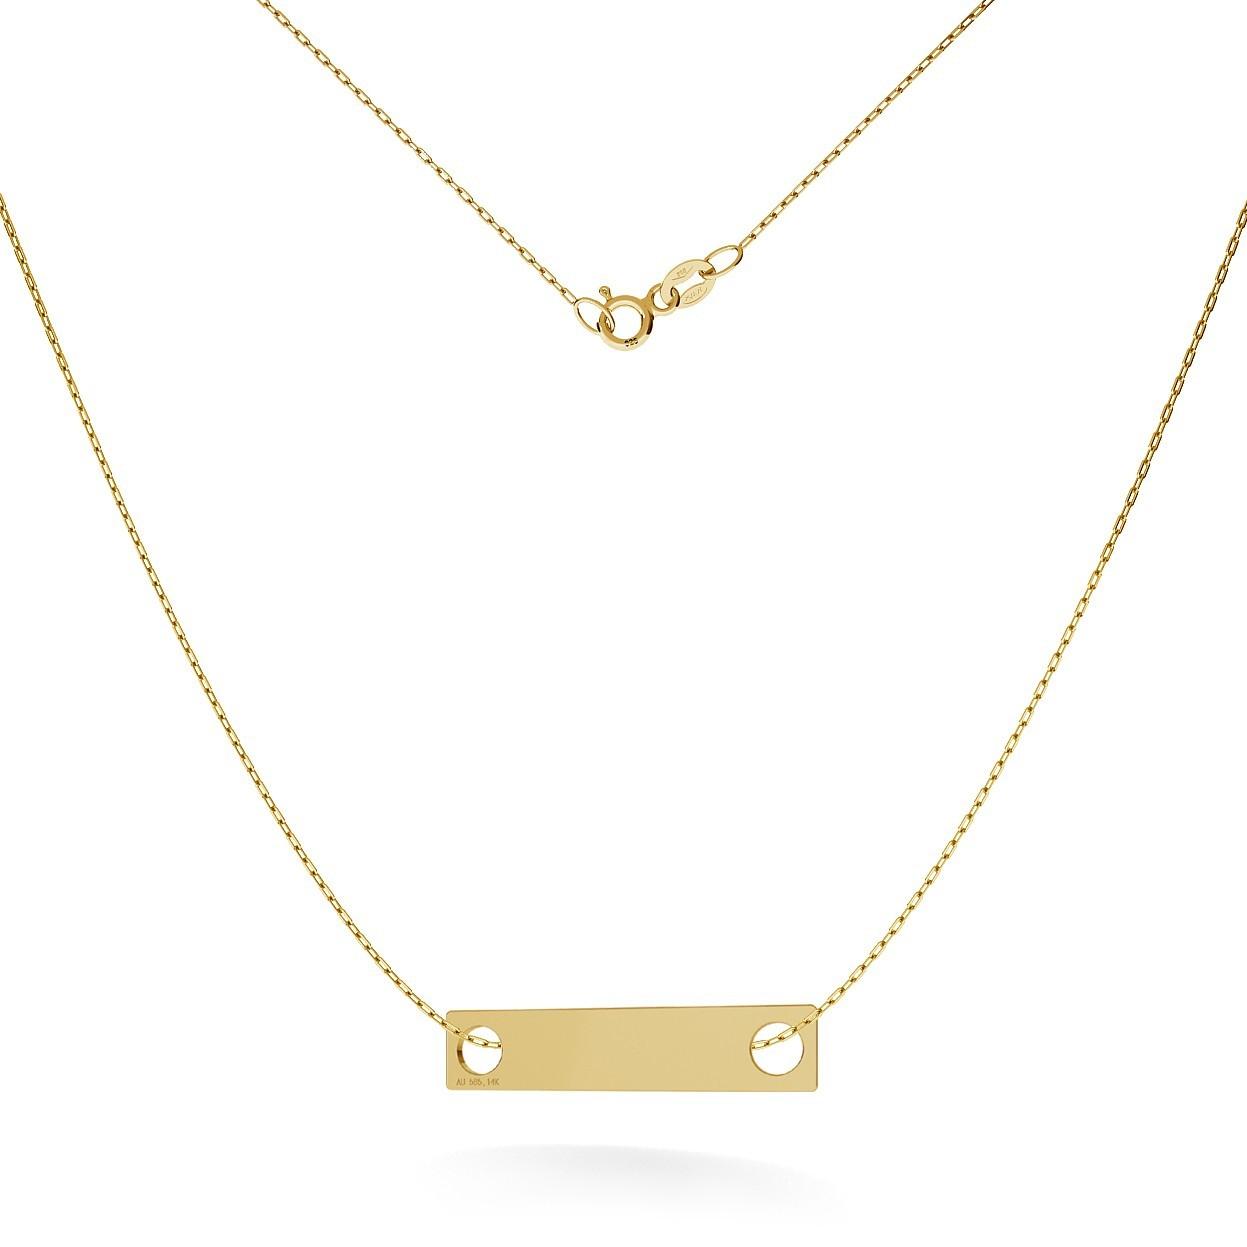 GOLD RECTANGLE NECKLACE 14K, MODEL 18